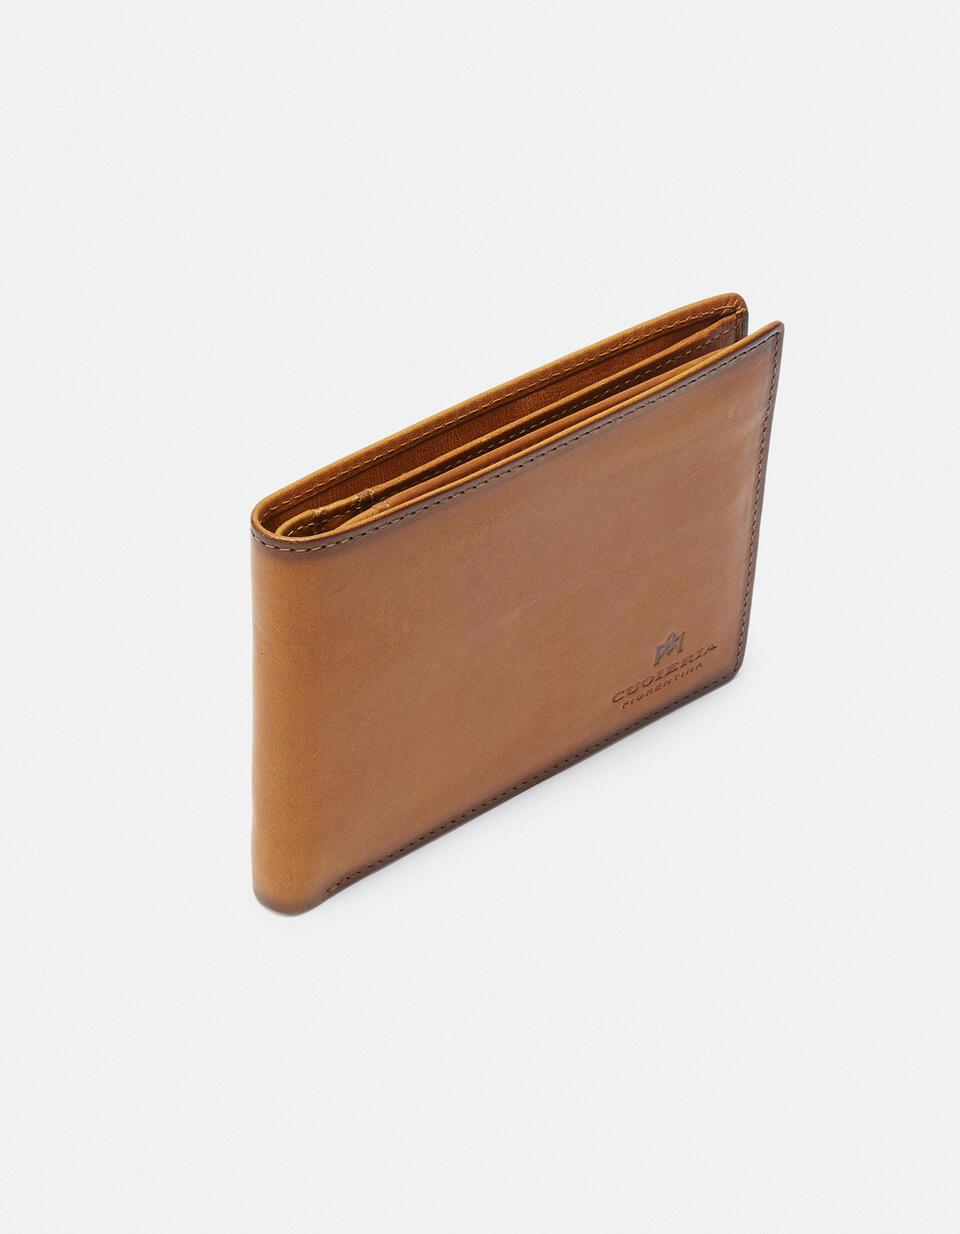 Leather Warm and Color Anti-RFid Wallet GIALLO Cuoieria Fiorentina